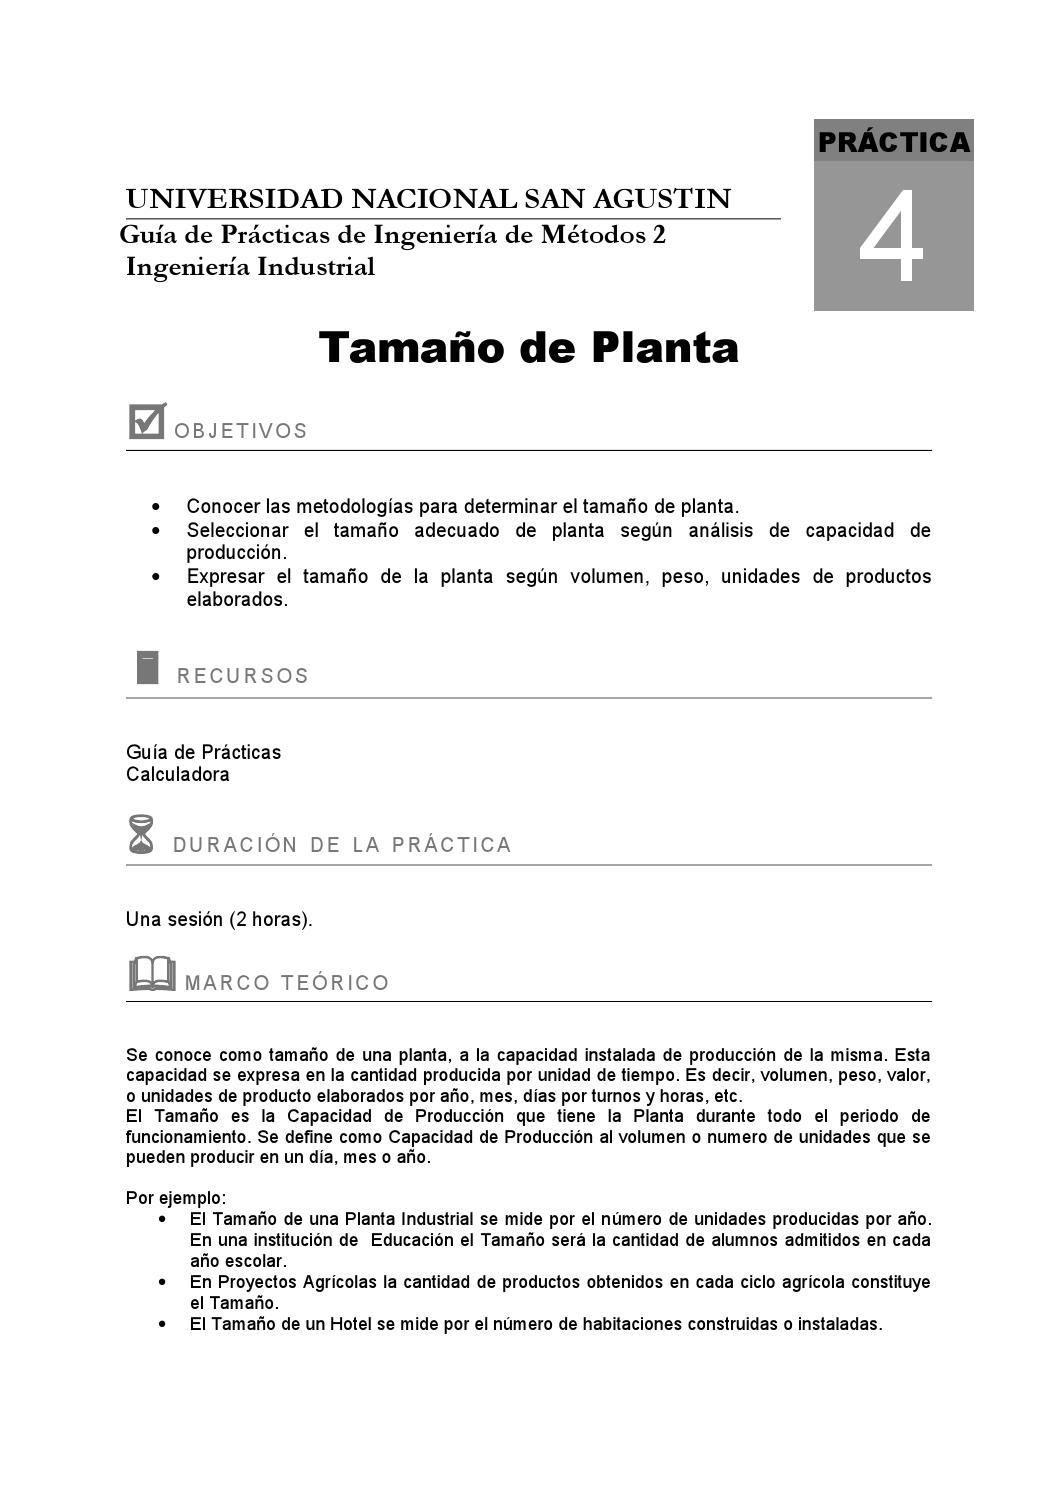 Guia4b tamaño de planta 2010 by AlejanDra Paola - issuu